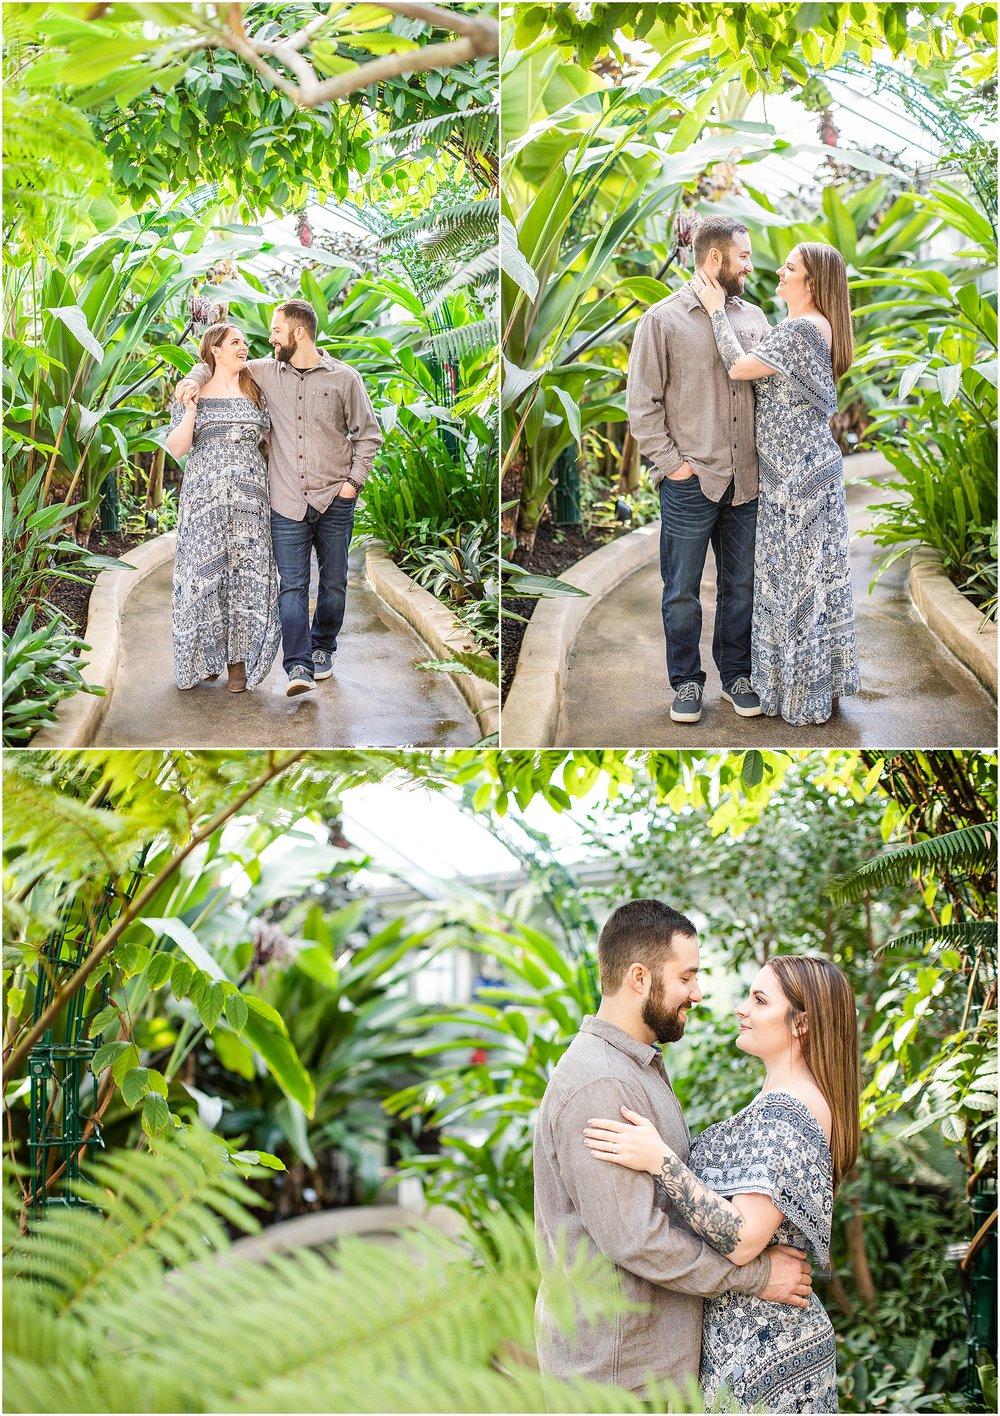 Rawlings-Conservatory-Engagement-Photos_0284.jpg